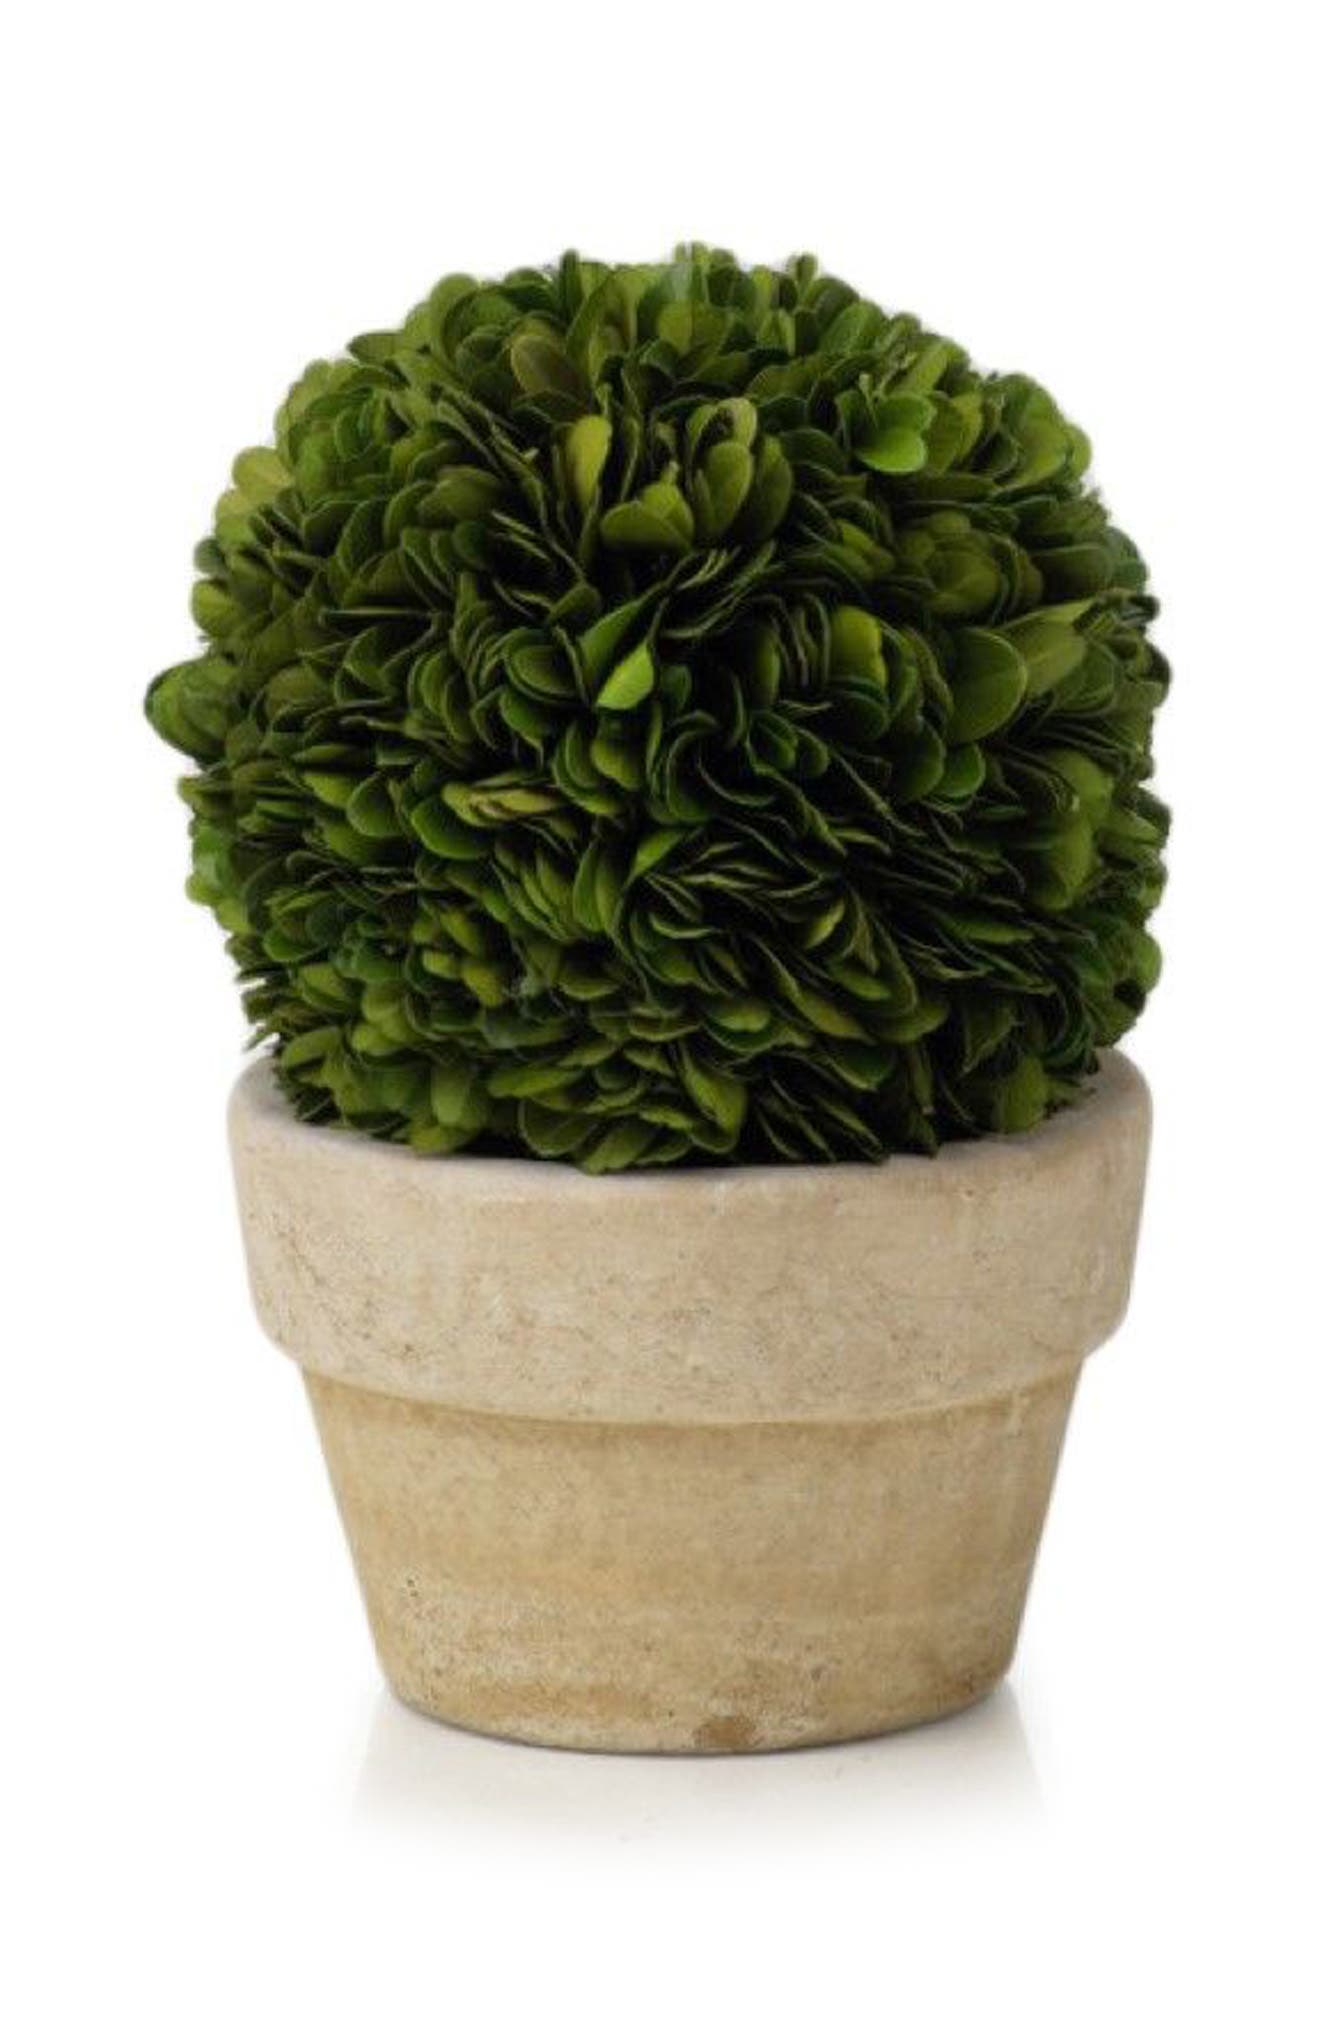 Zodax Boxwood Topiary Decoration